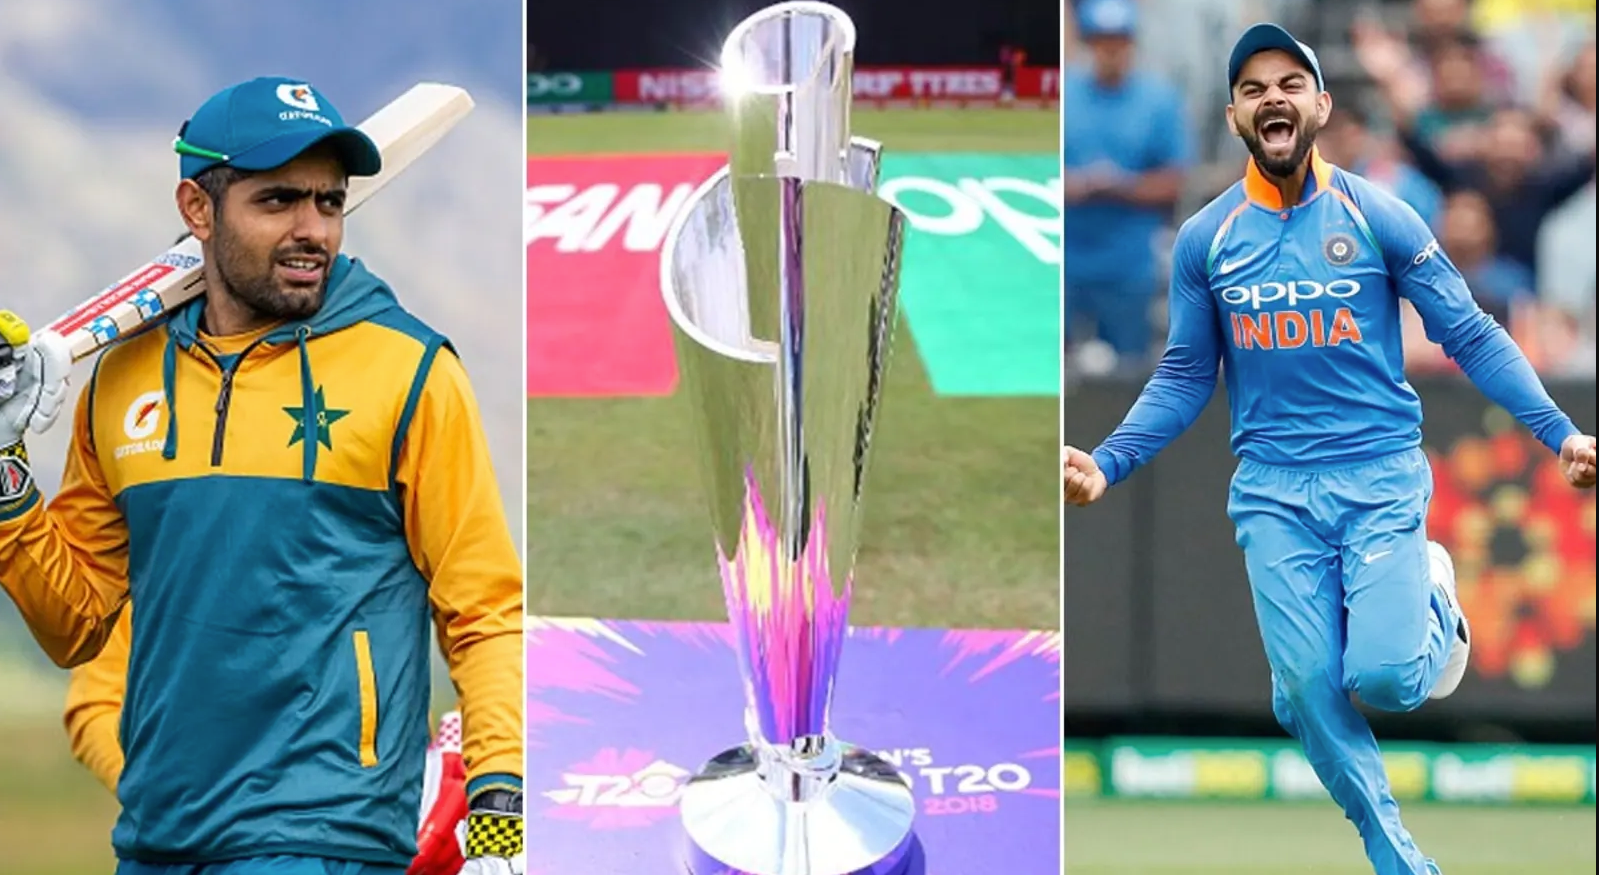 India vs Pakistan Match Announced